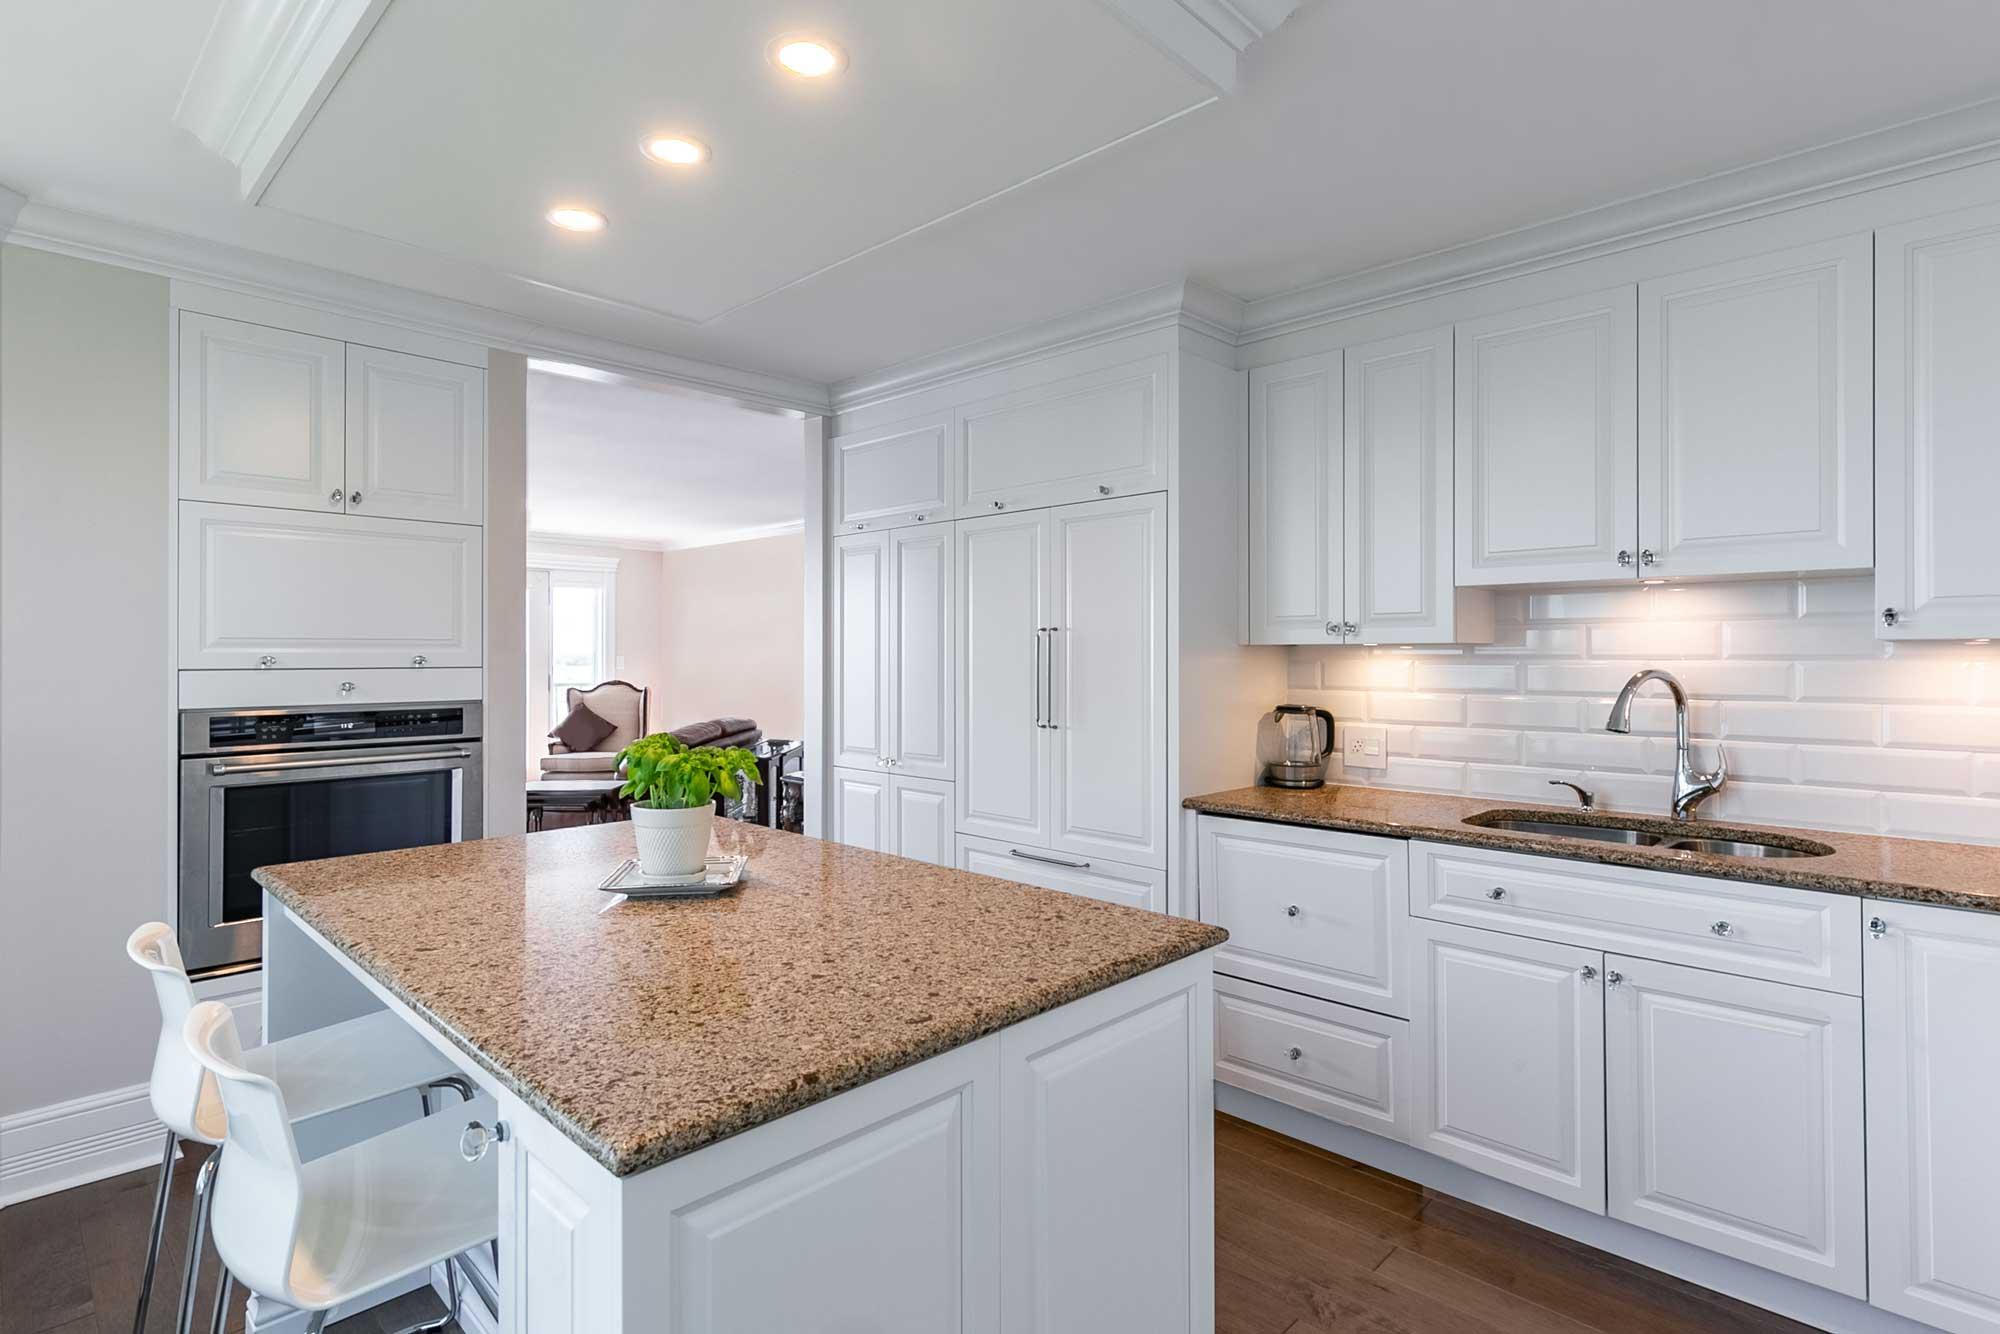 cuisine classique blanche avec comptoir en granite